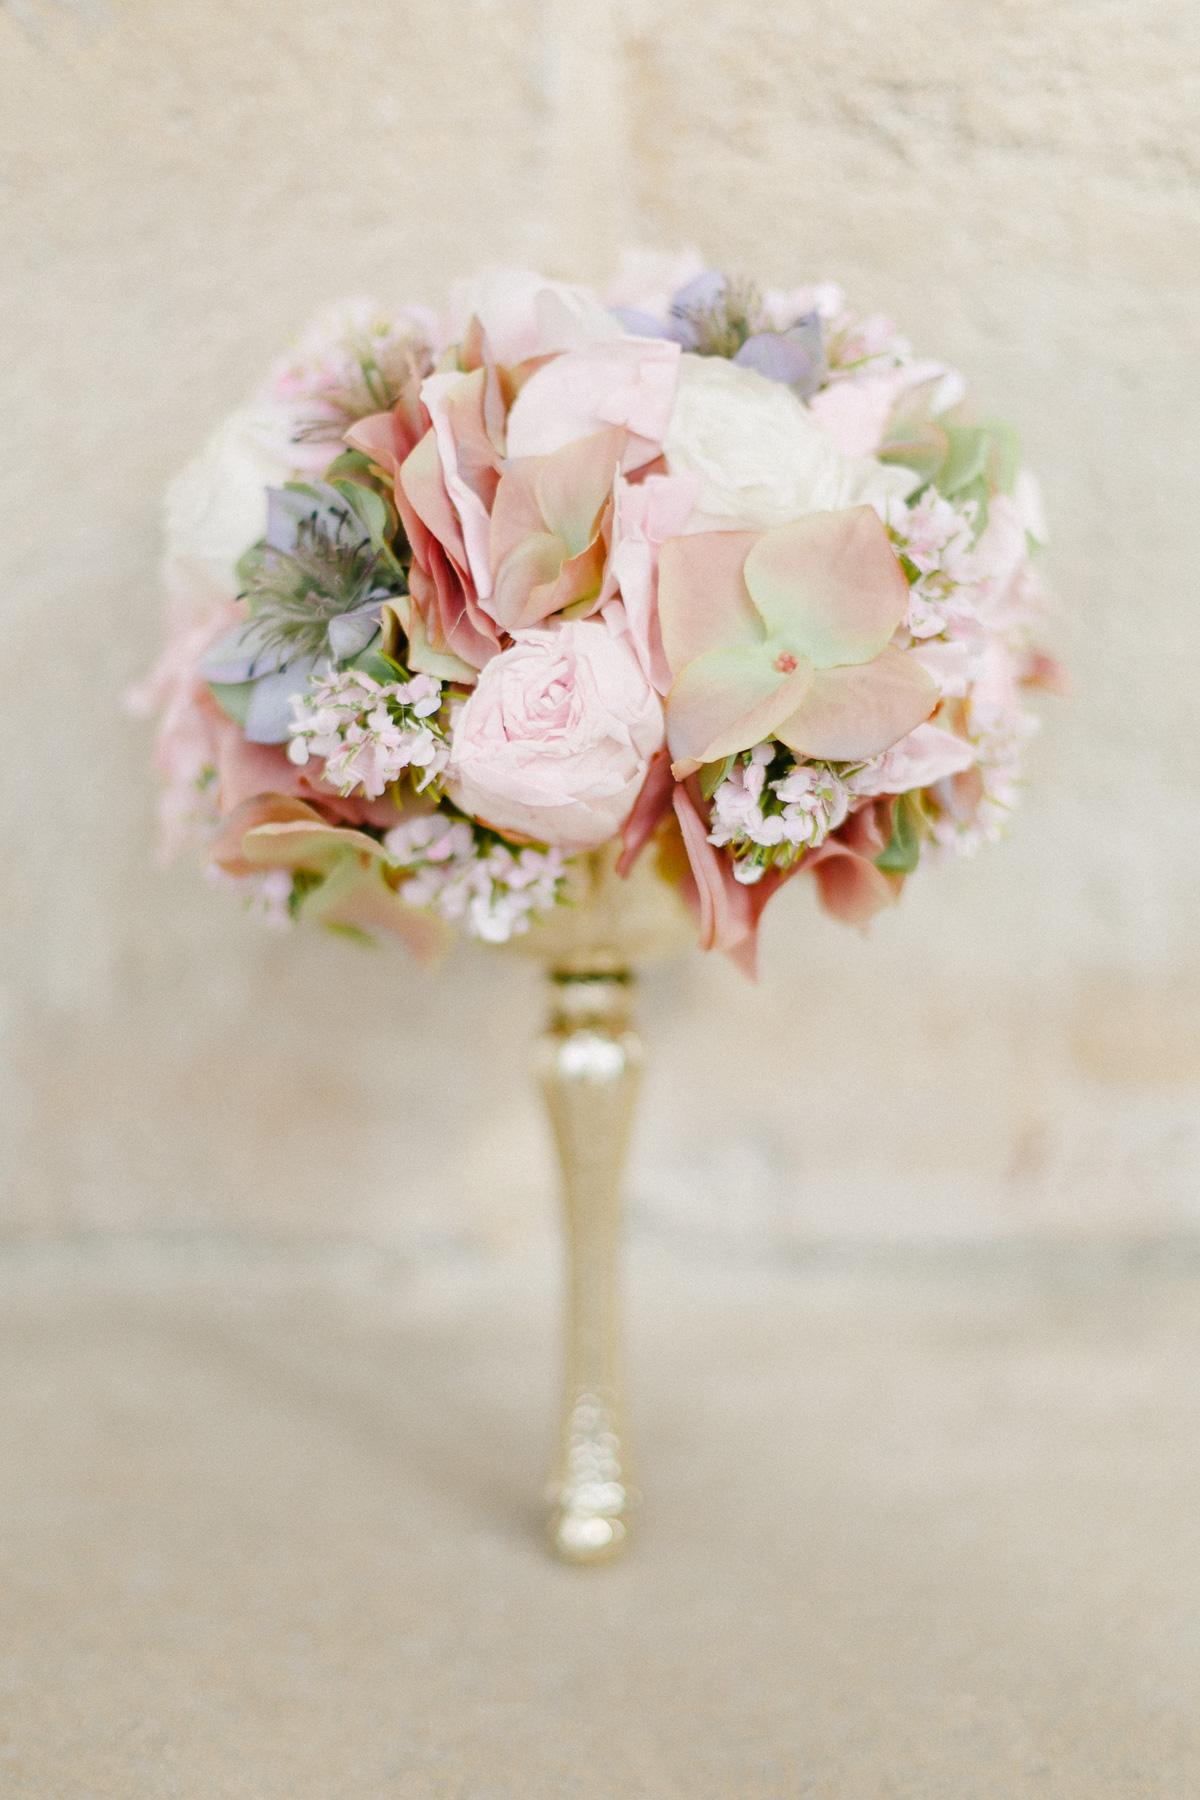 Brautstrauß pastell rosa